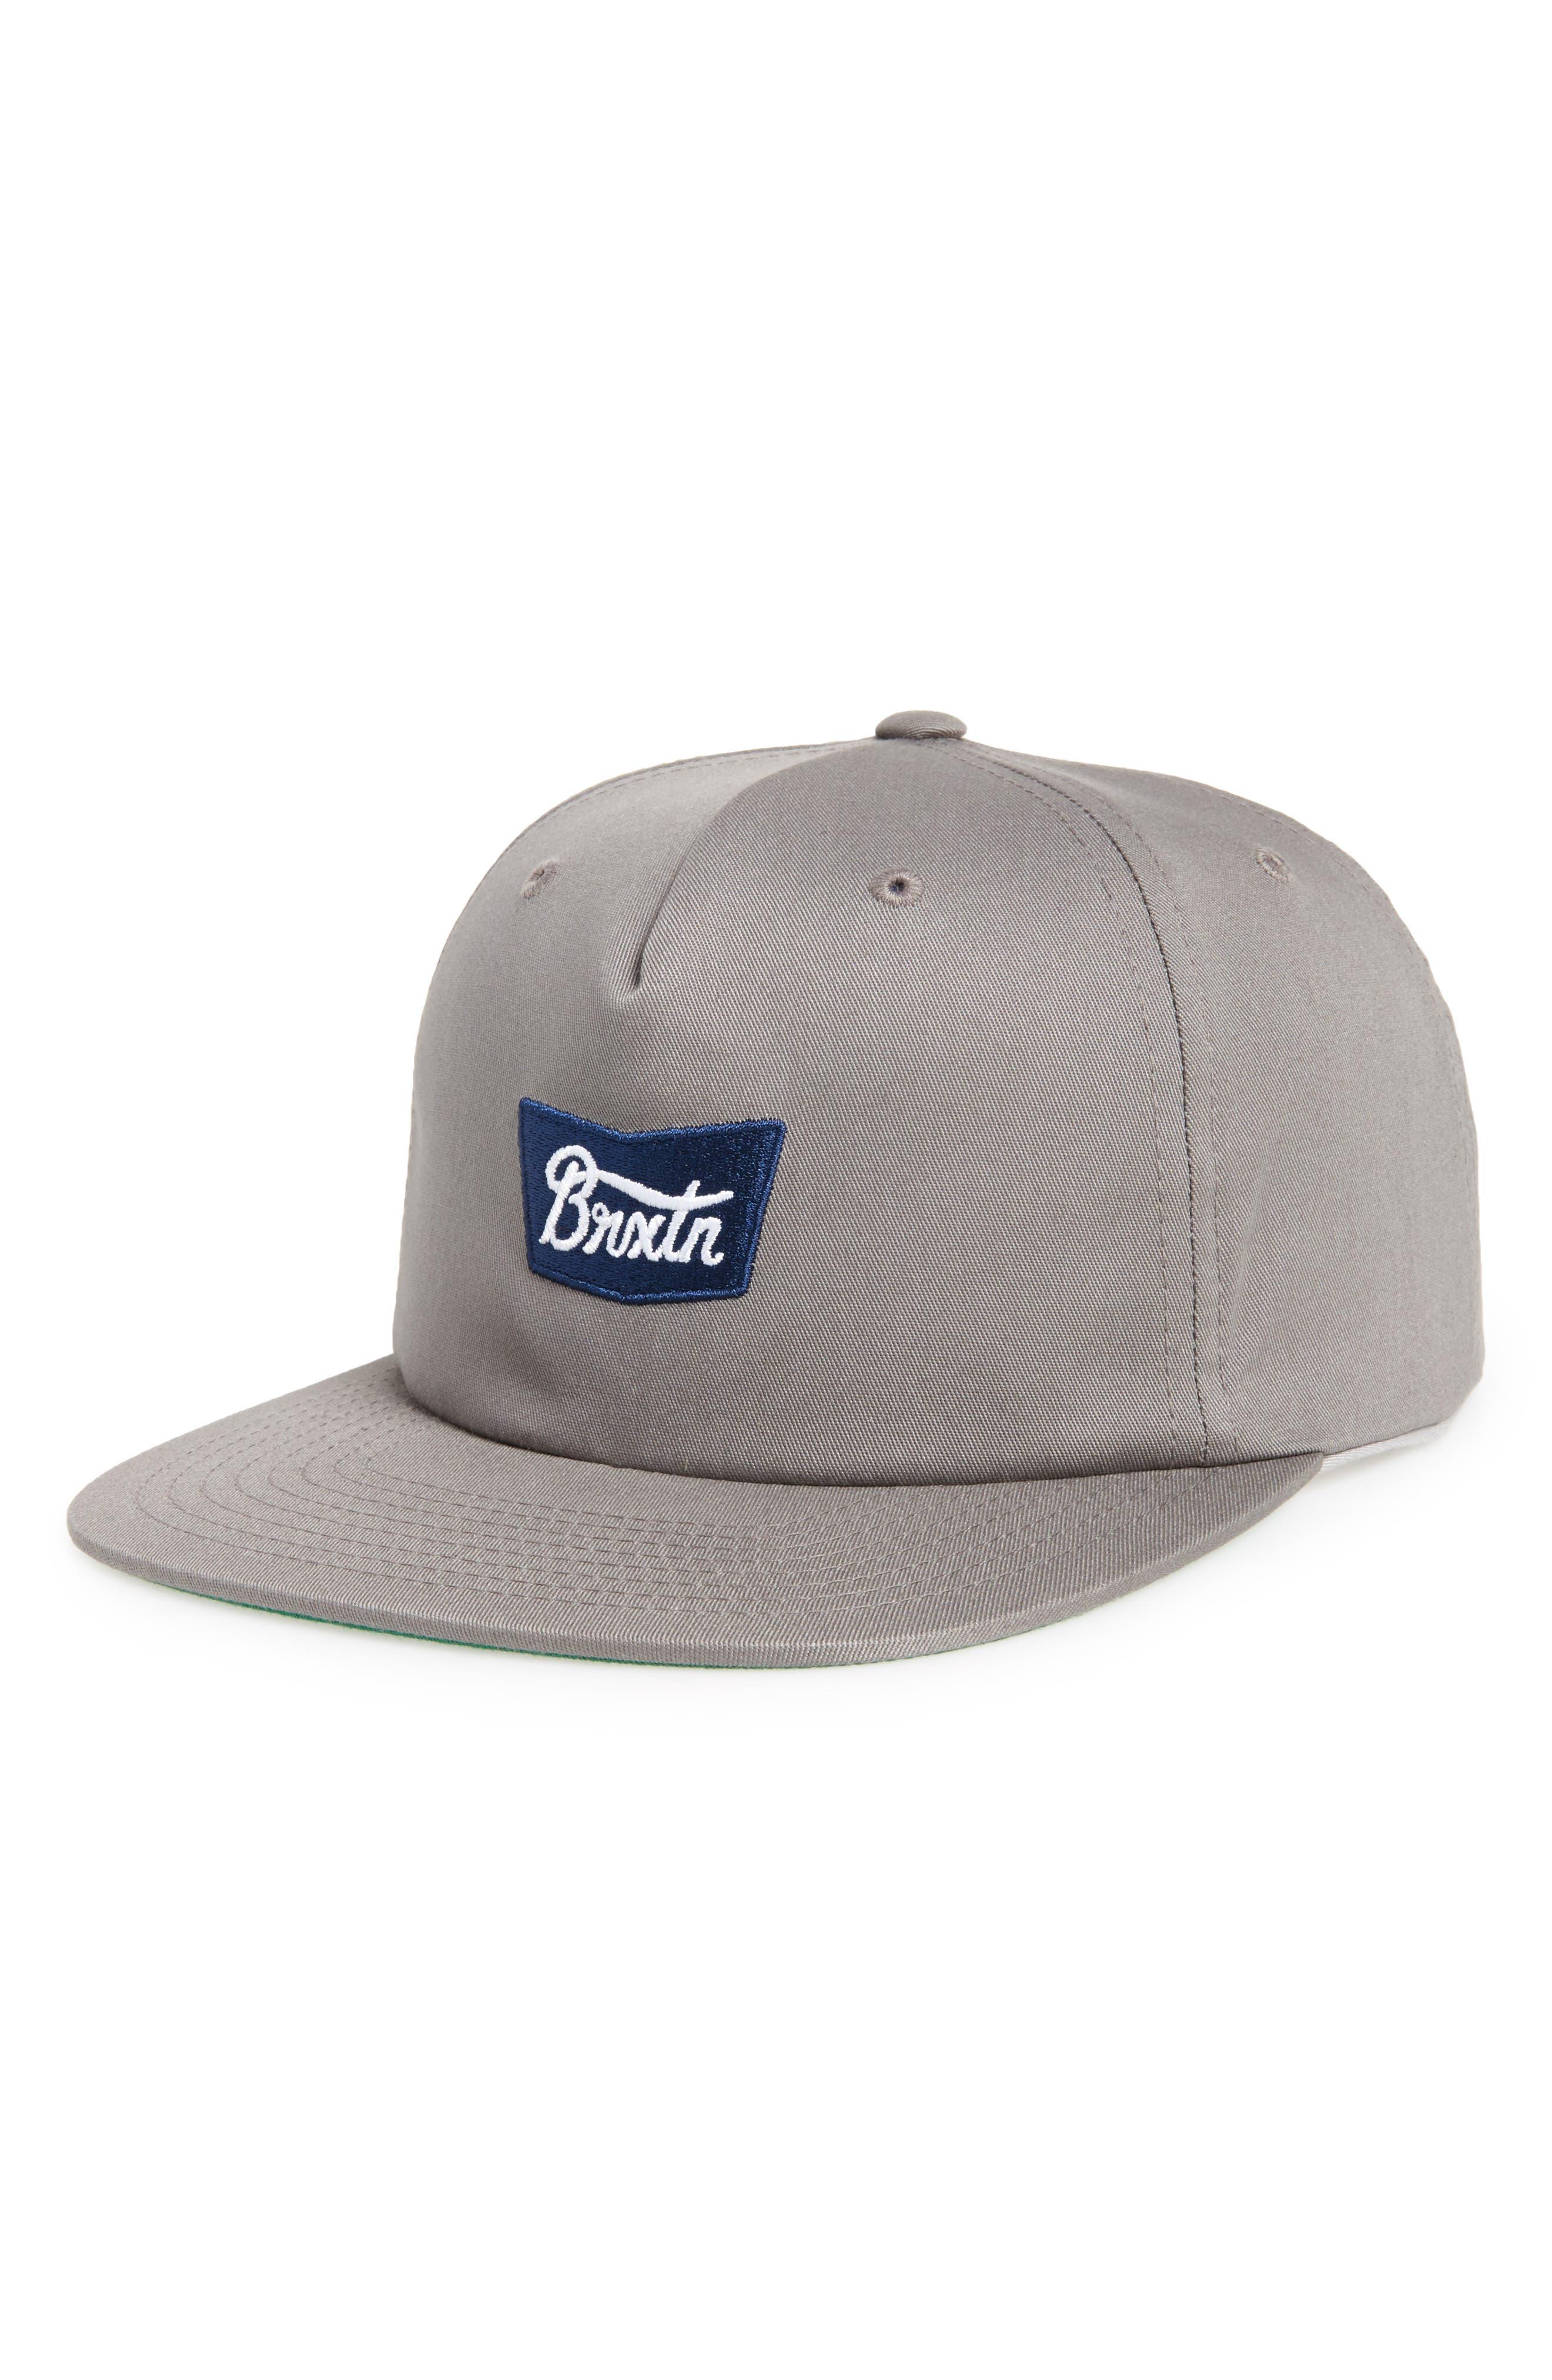 BRIXTON Snapback Baseball Cap